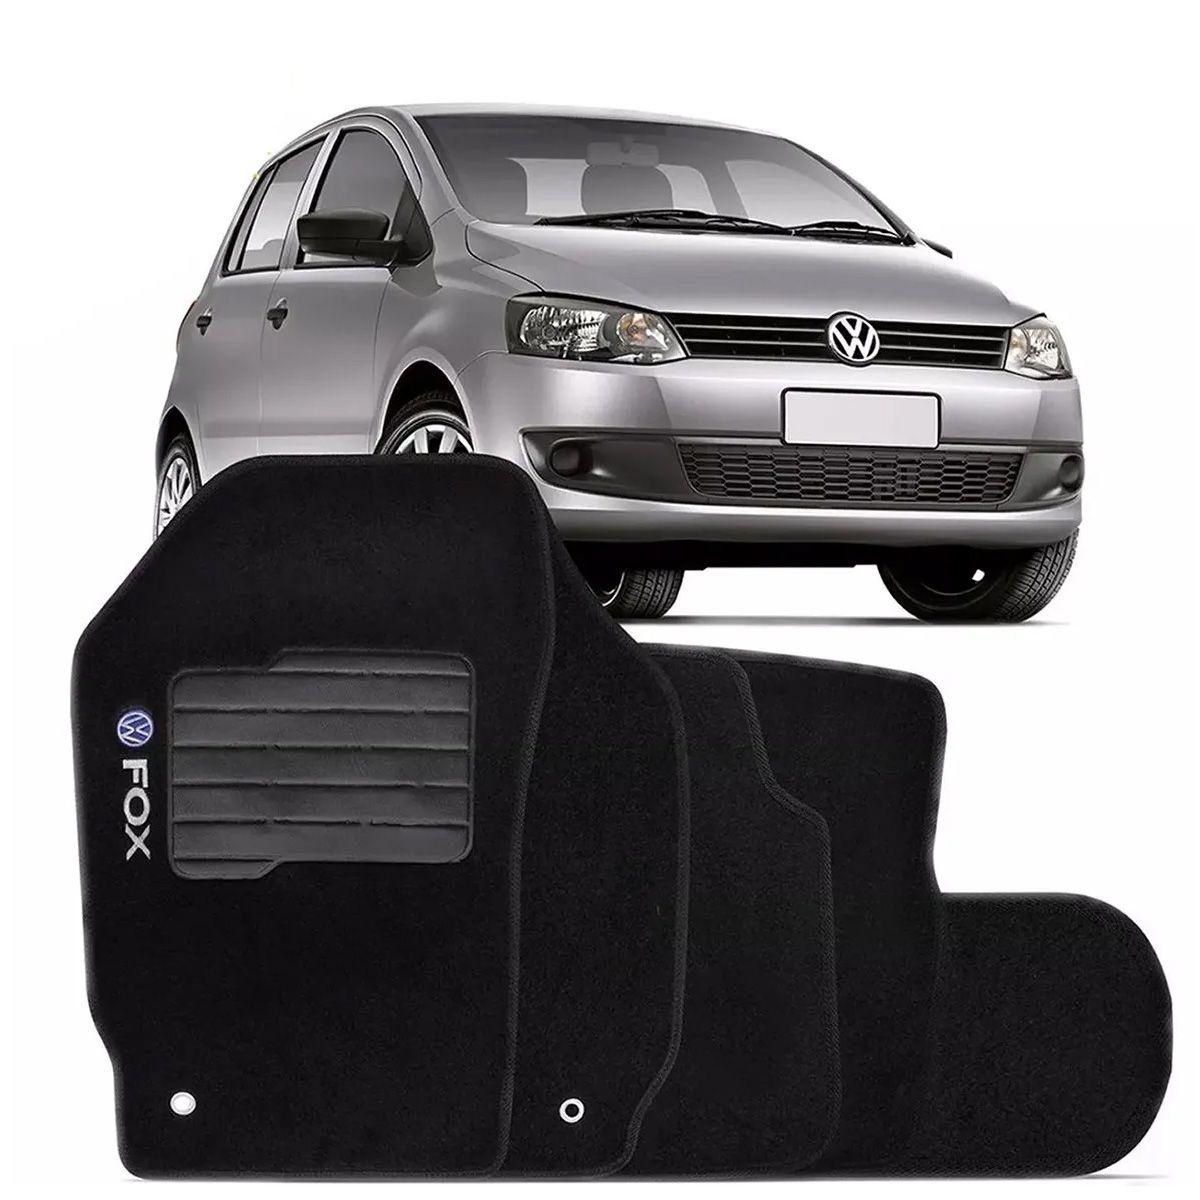 Tapete Carpete Volkswagen Fox 2003 a 2014 Preto Logo Bordado Personalizado Poliparts